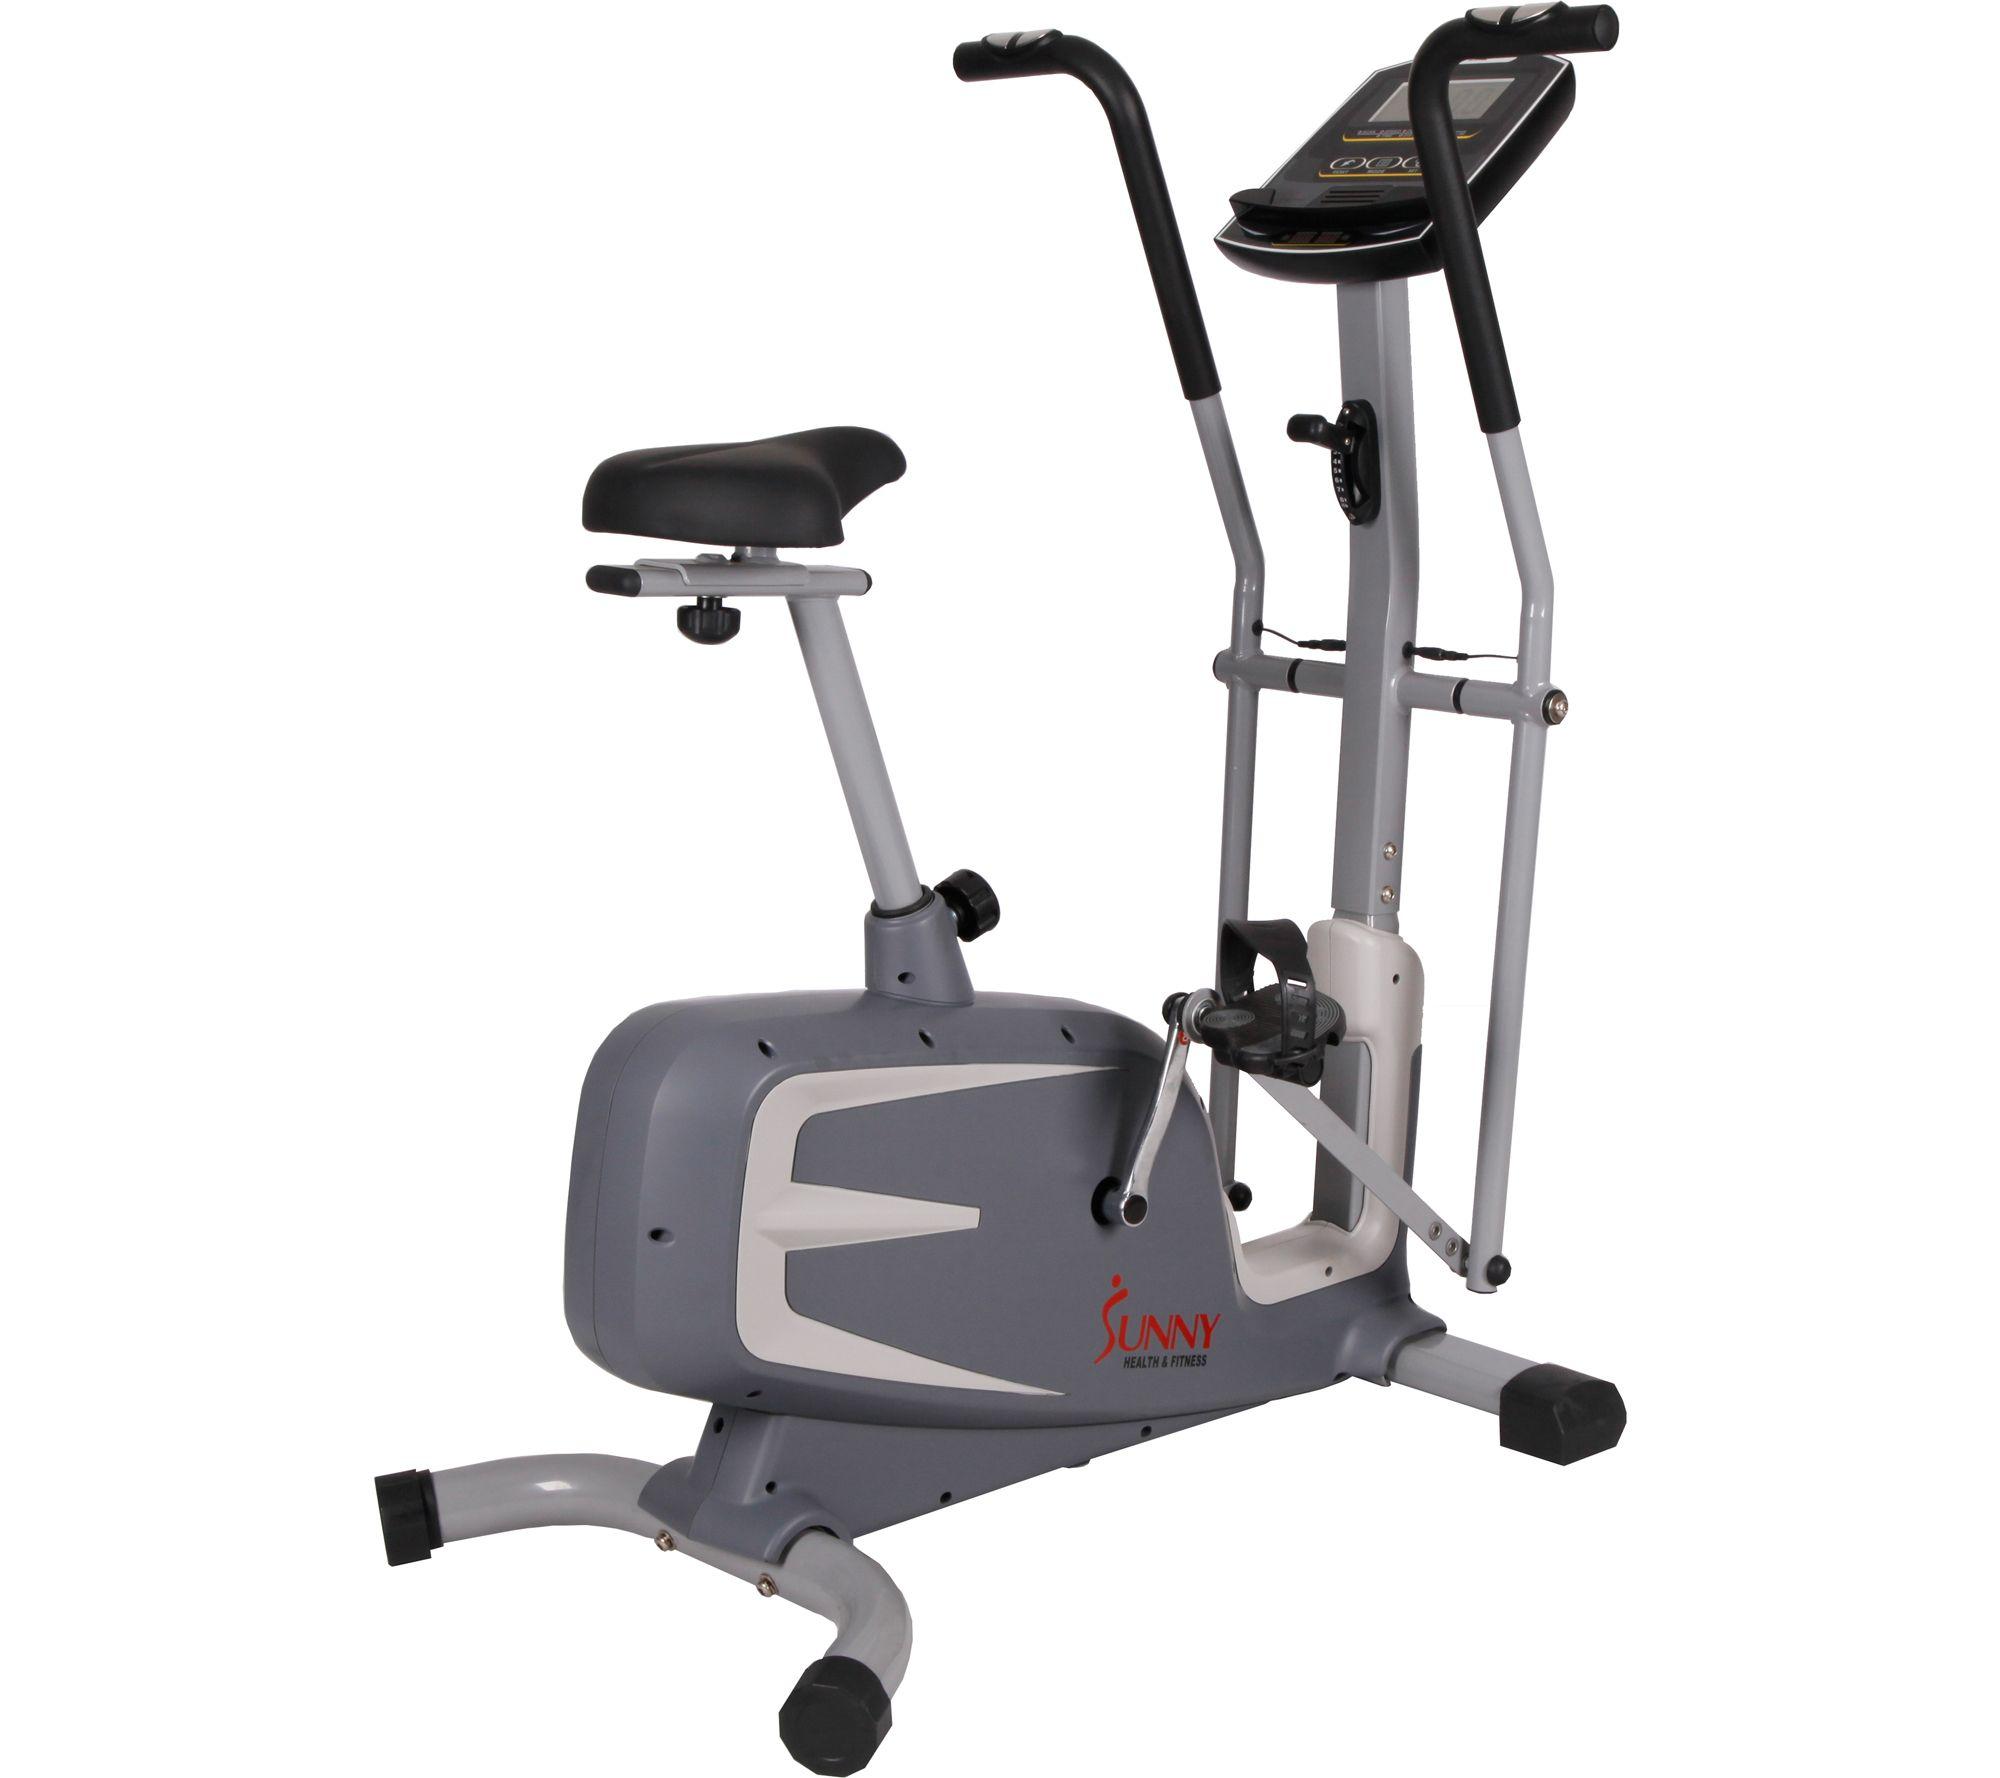 Sunny Health & Fitness Cross Training MagneticUpright Bike